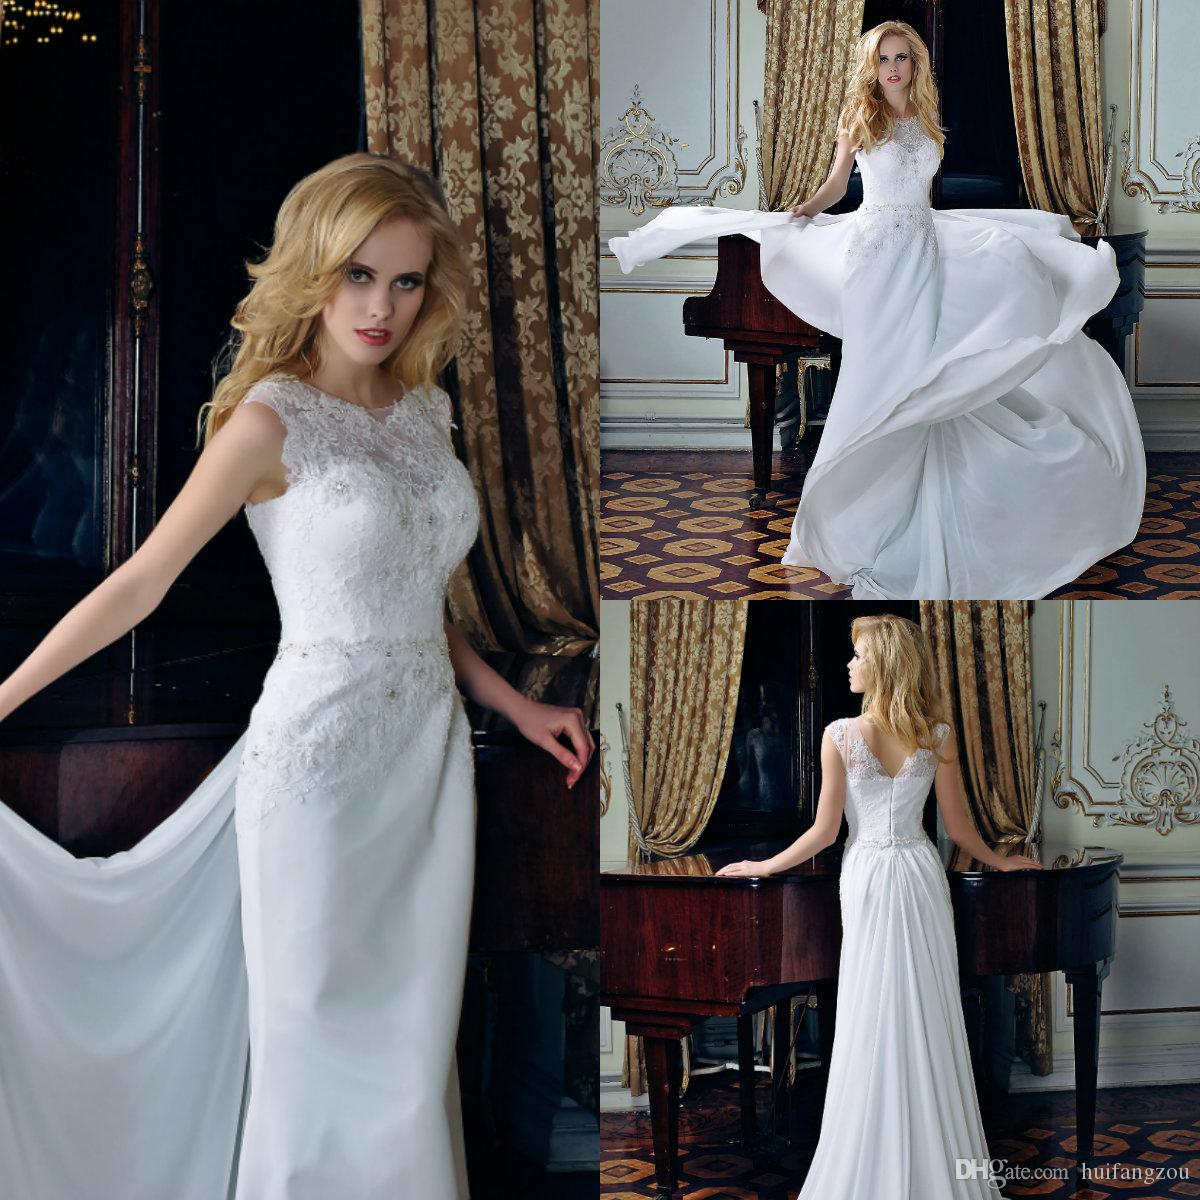 54e653332185 Discount 2019 Summer Beach Wedding Dresses Jewel Neck Lace Beaded Sweep  Train Bridal Gowns Louise Sposa Chiffon Boho Wedding Dress Princess Wedding  Gowns ...